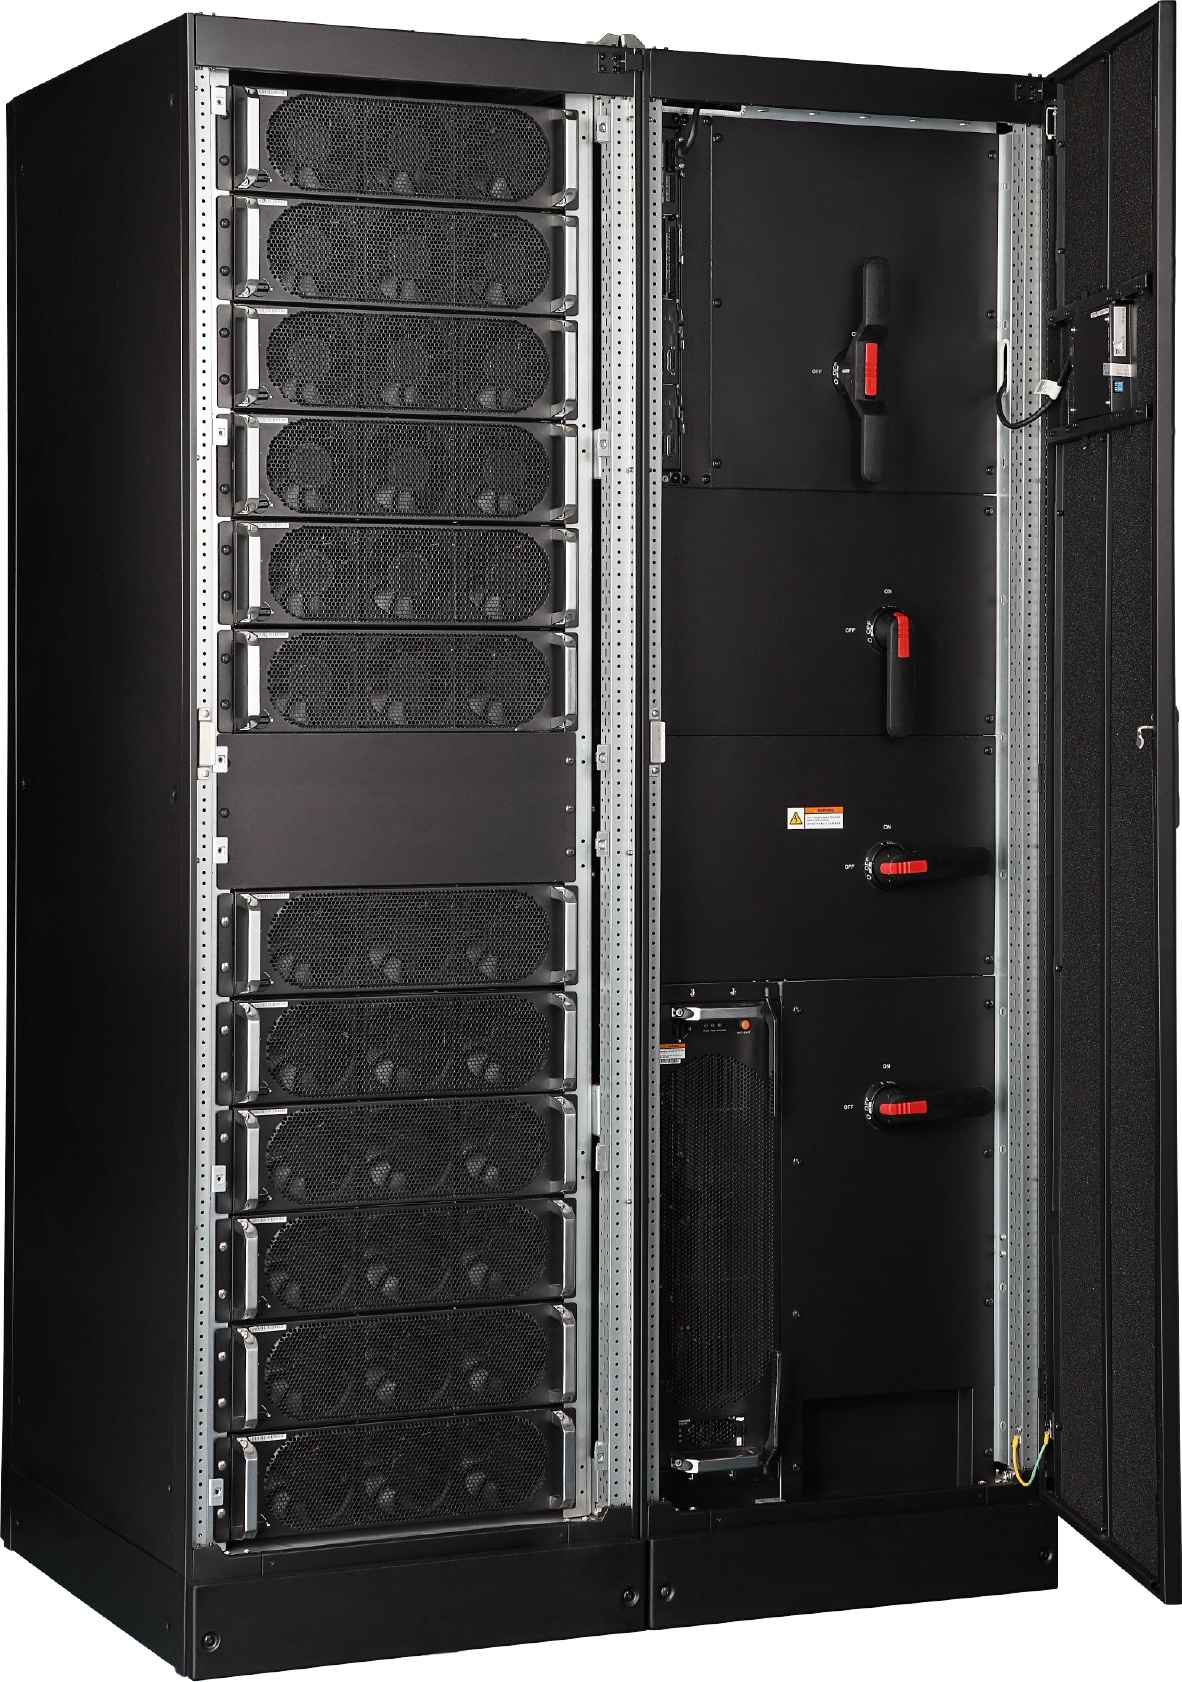 UPS5000-E系列 (25-800kVA)